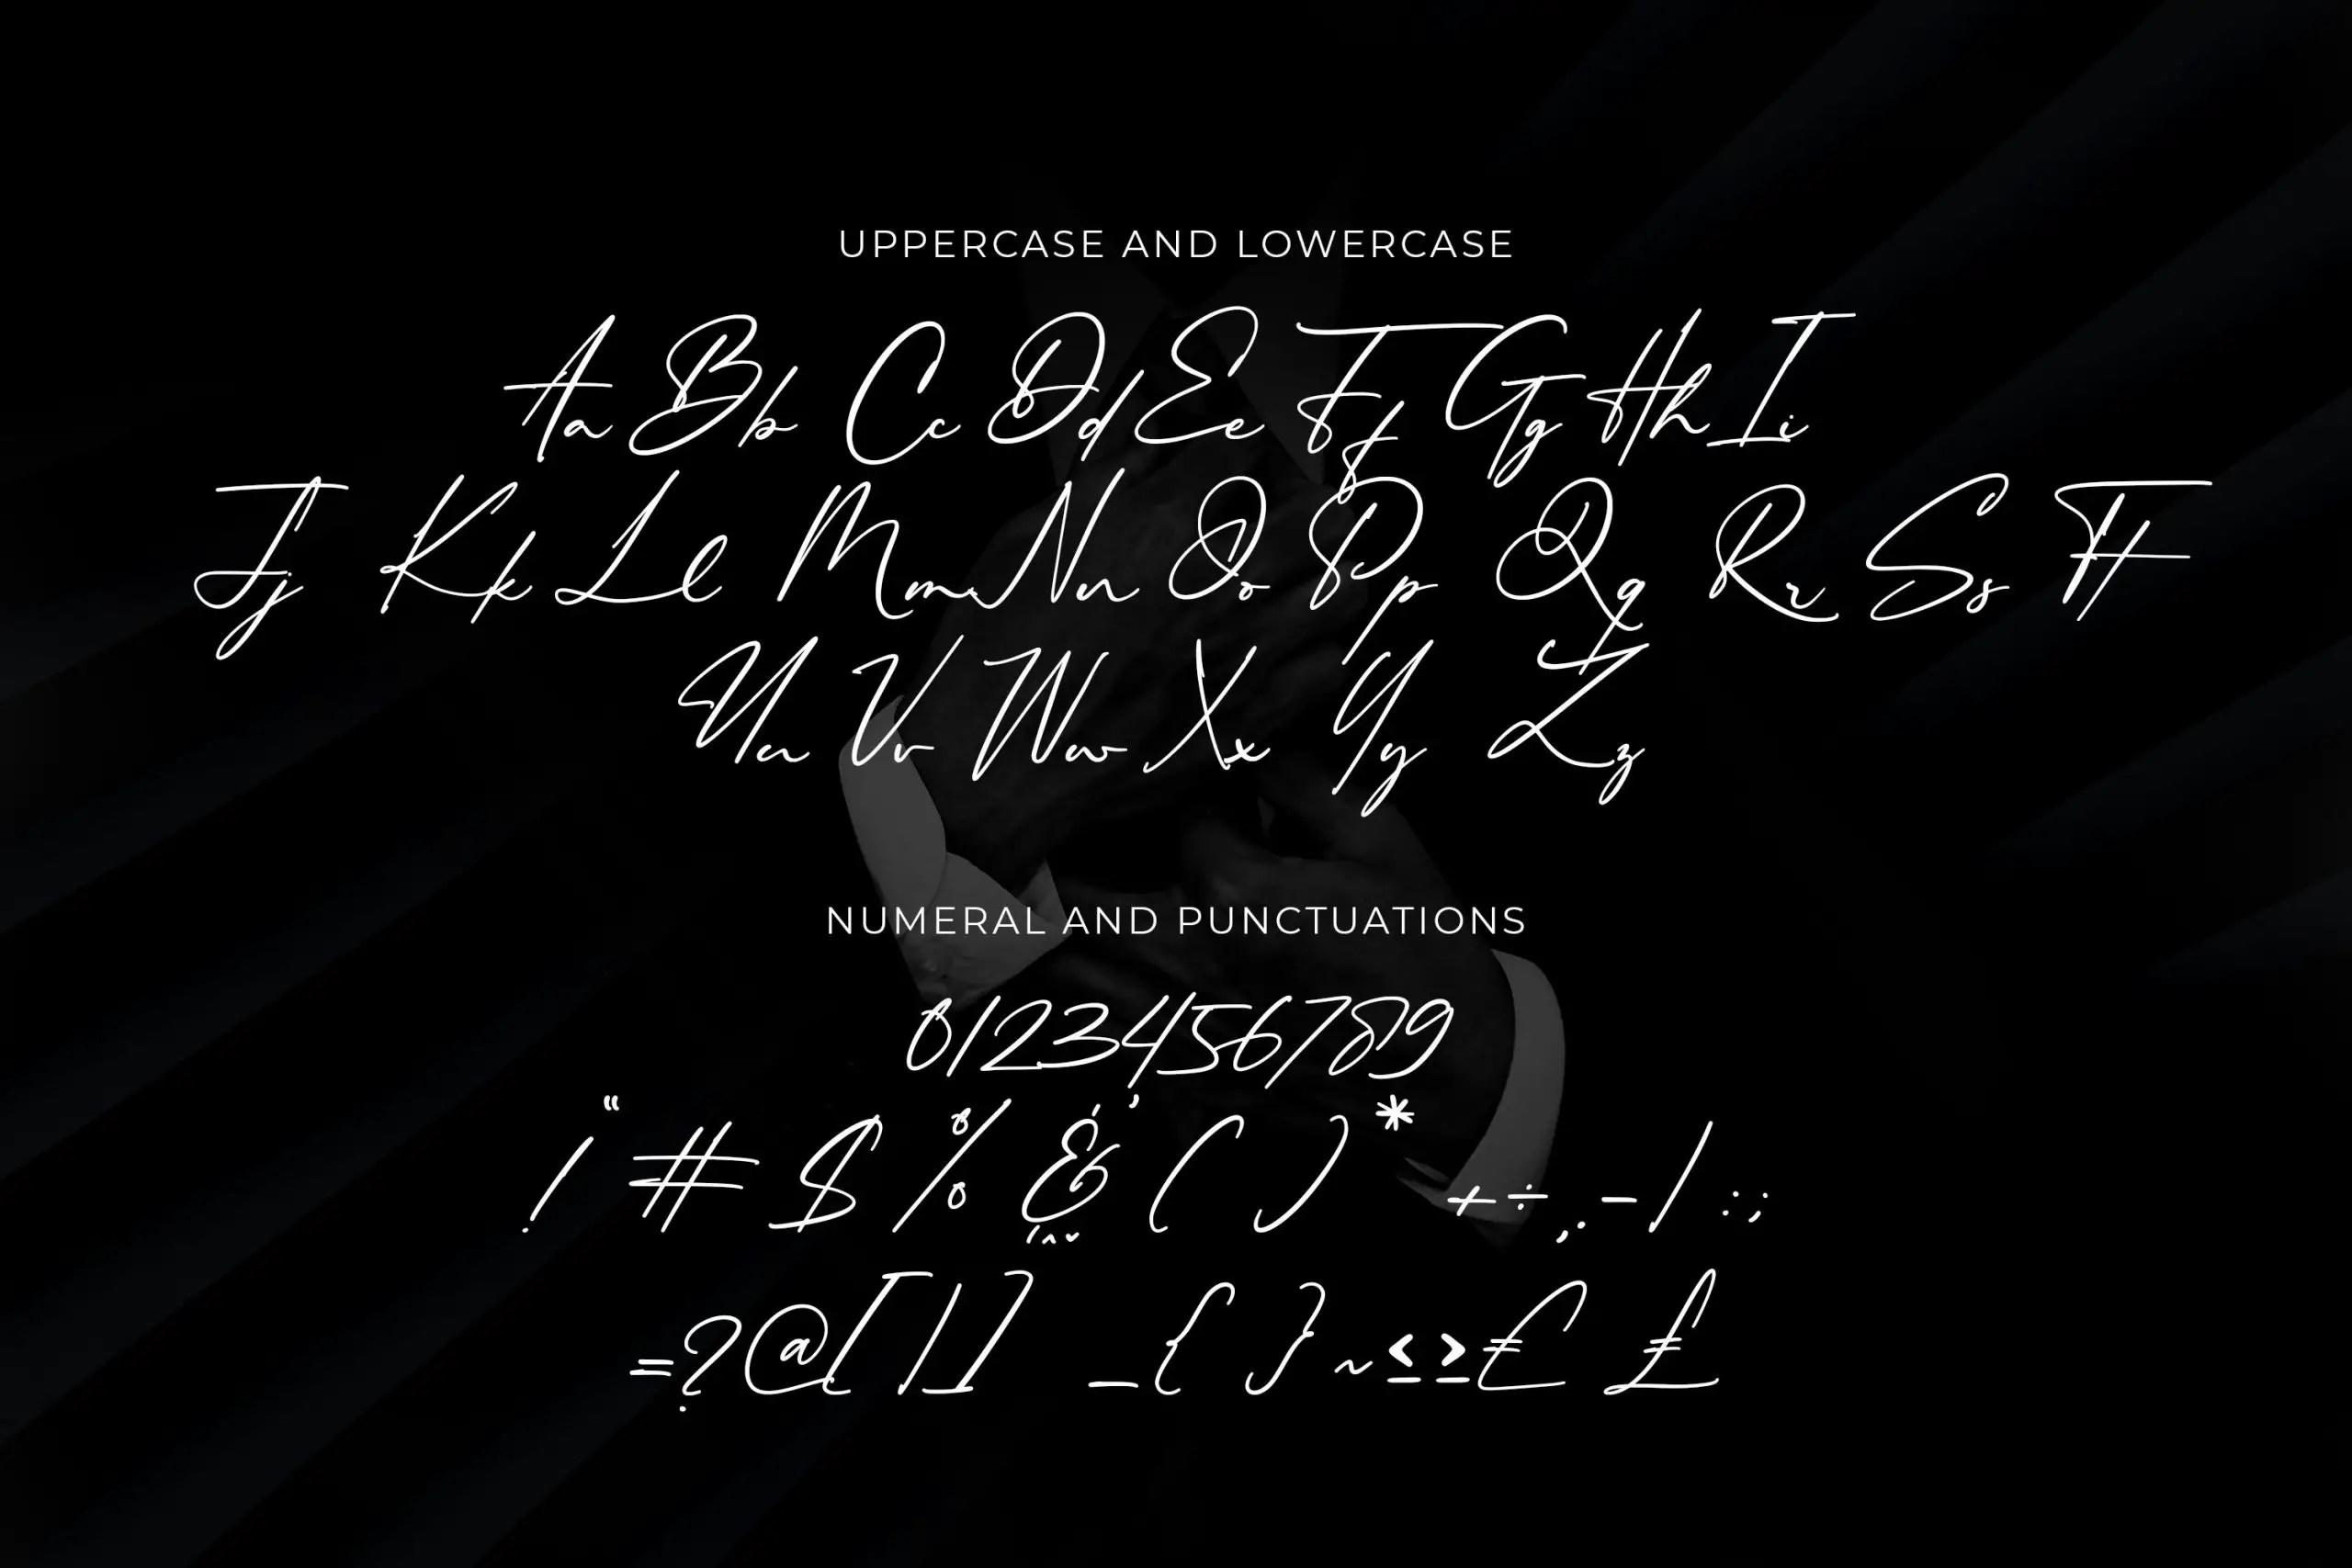 Philips Dutcher Stylish Signature Font -3